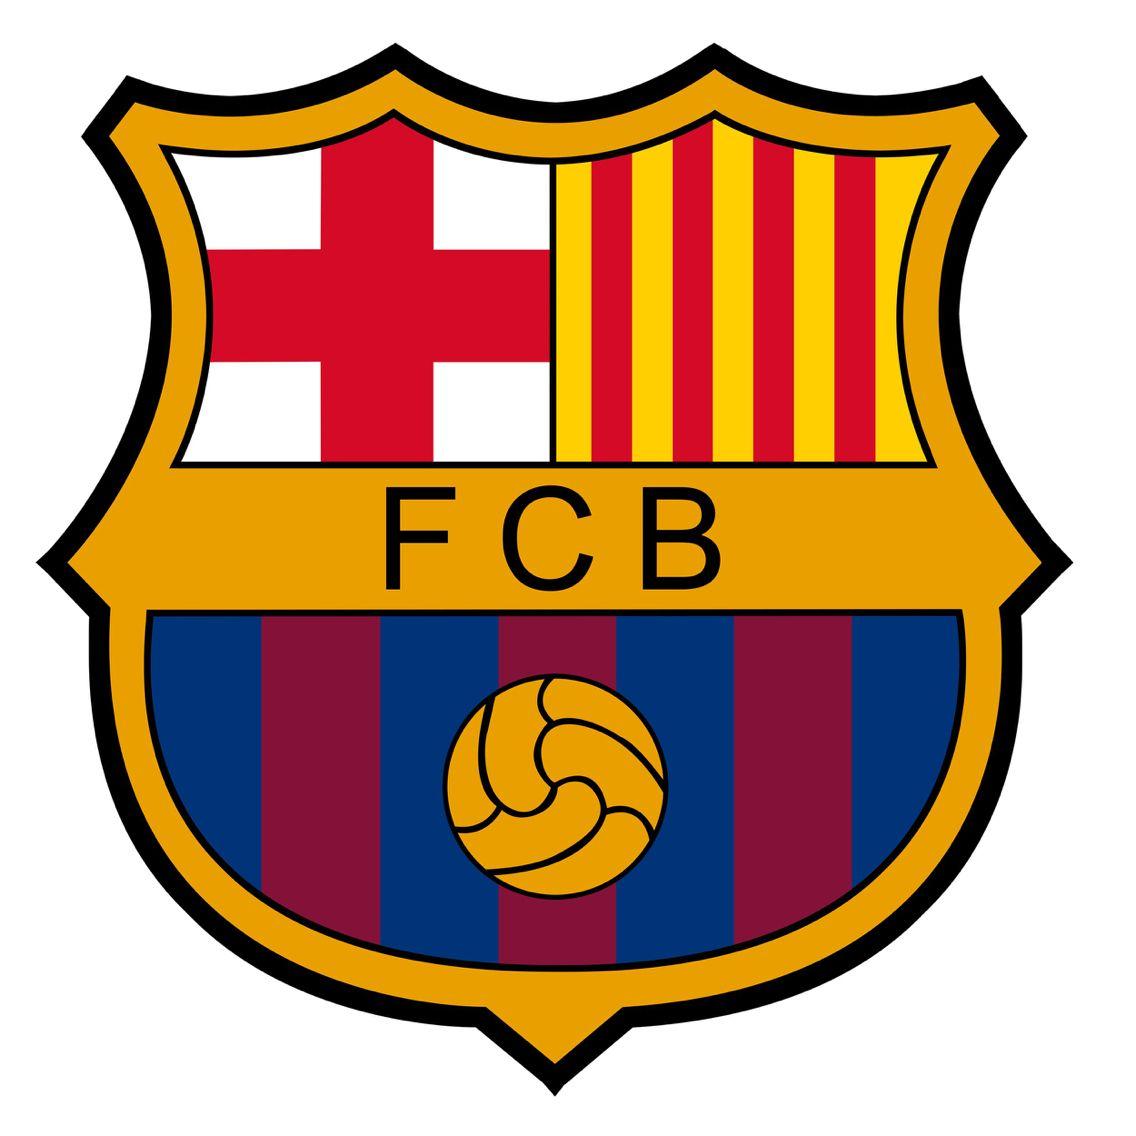 1899 Futbol Club Barcelona Barcelona Espana Estadio Camp Nou Barcelona Fcbarcelona 207 Ln Escudo Del Barcelona Escudo De Barcelona Logo De Barcelona